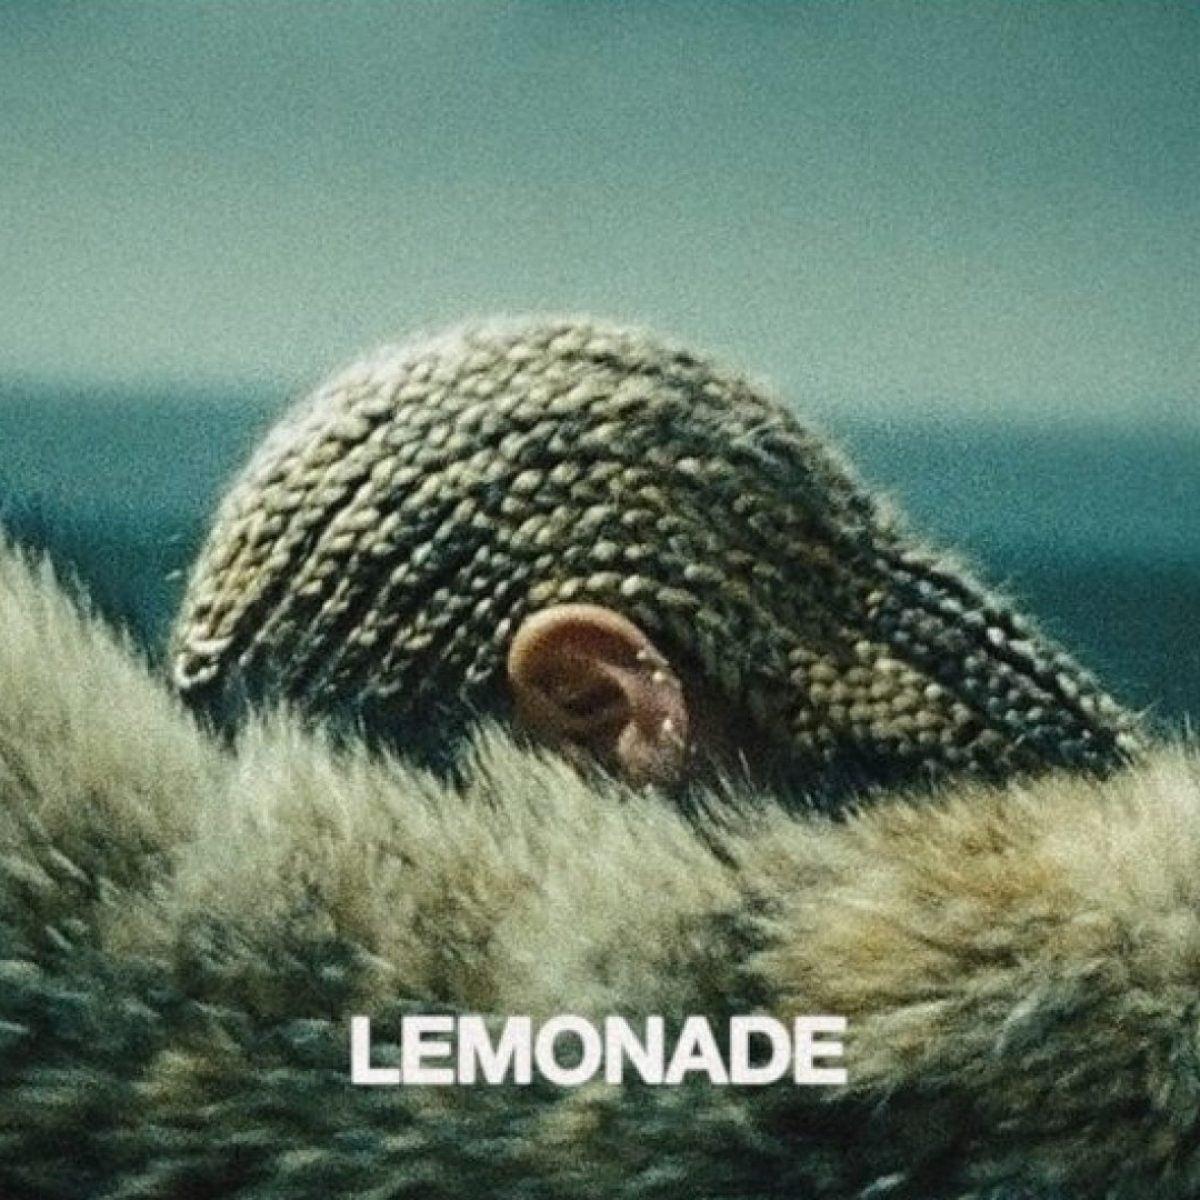 How 'Lemonade' Shifted Beyoncé's Art And Career